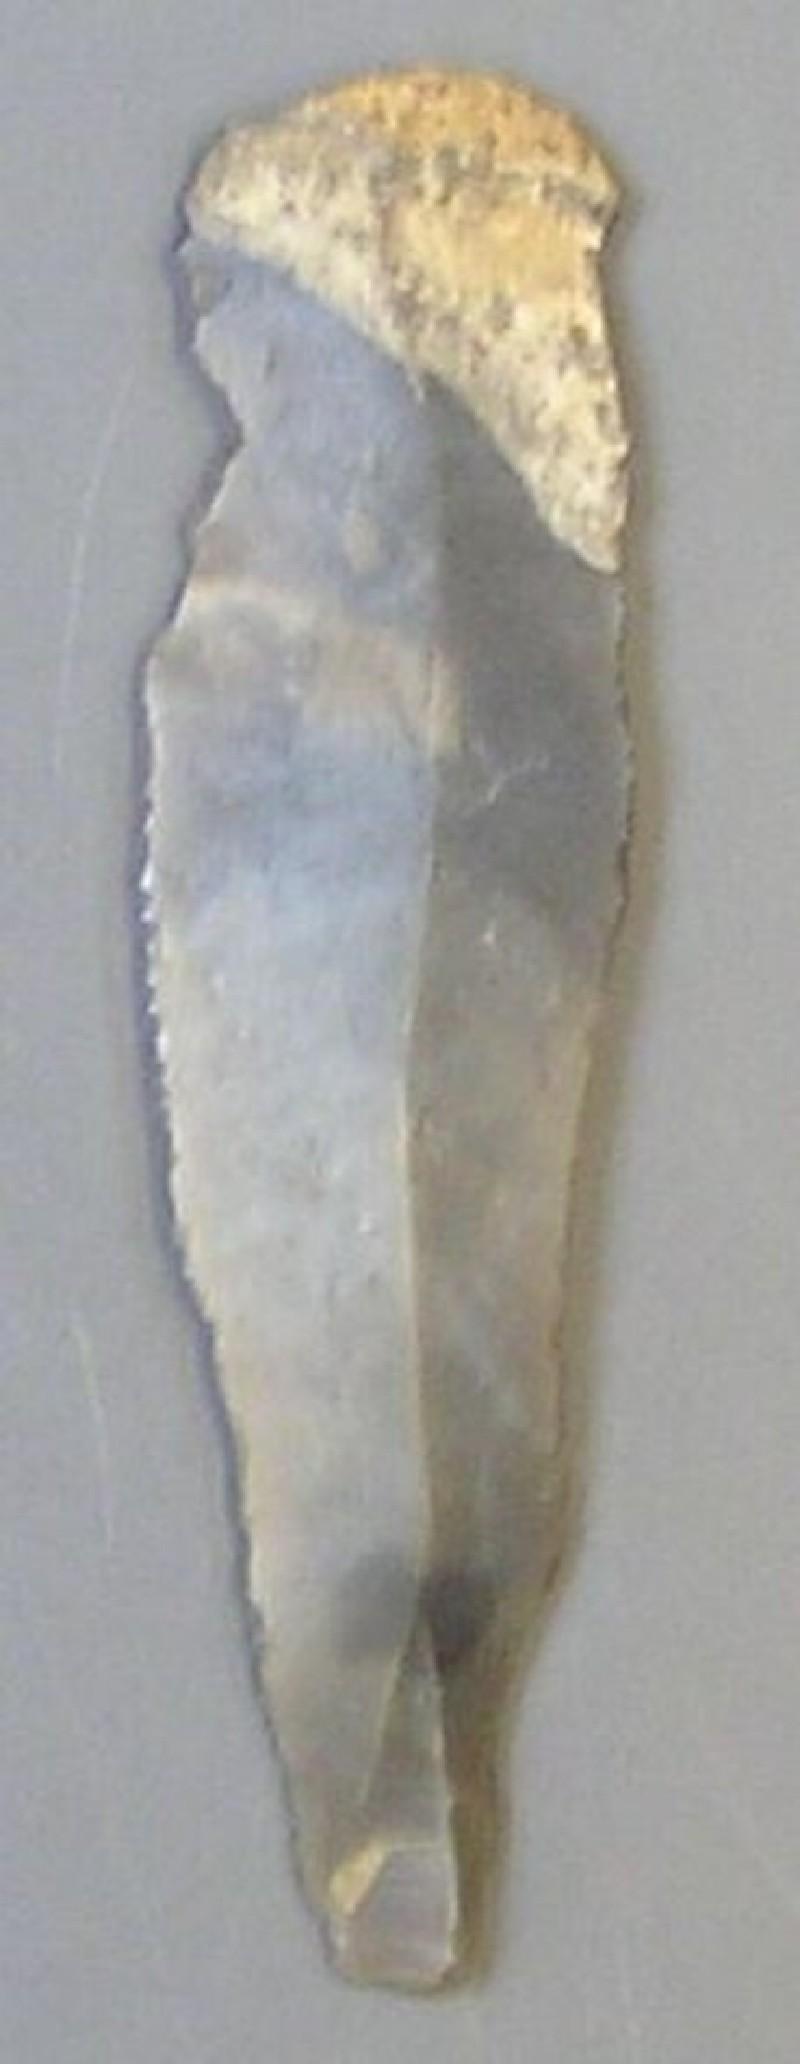 Blade (AN1966.1561, record shot)